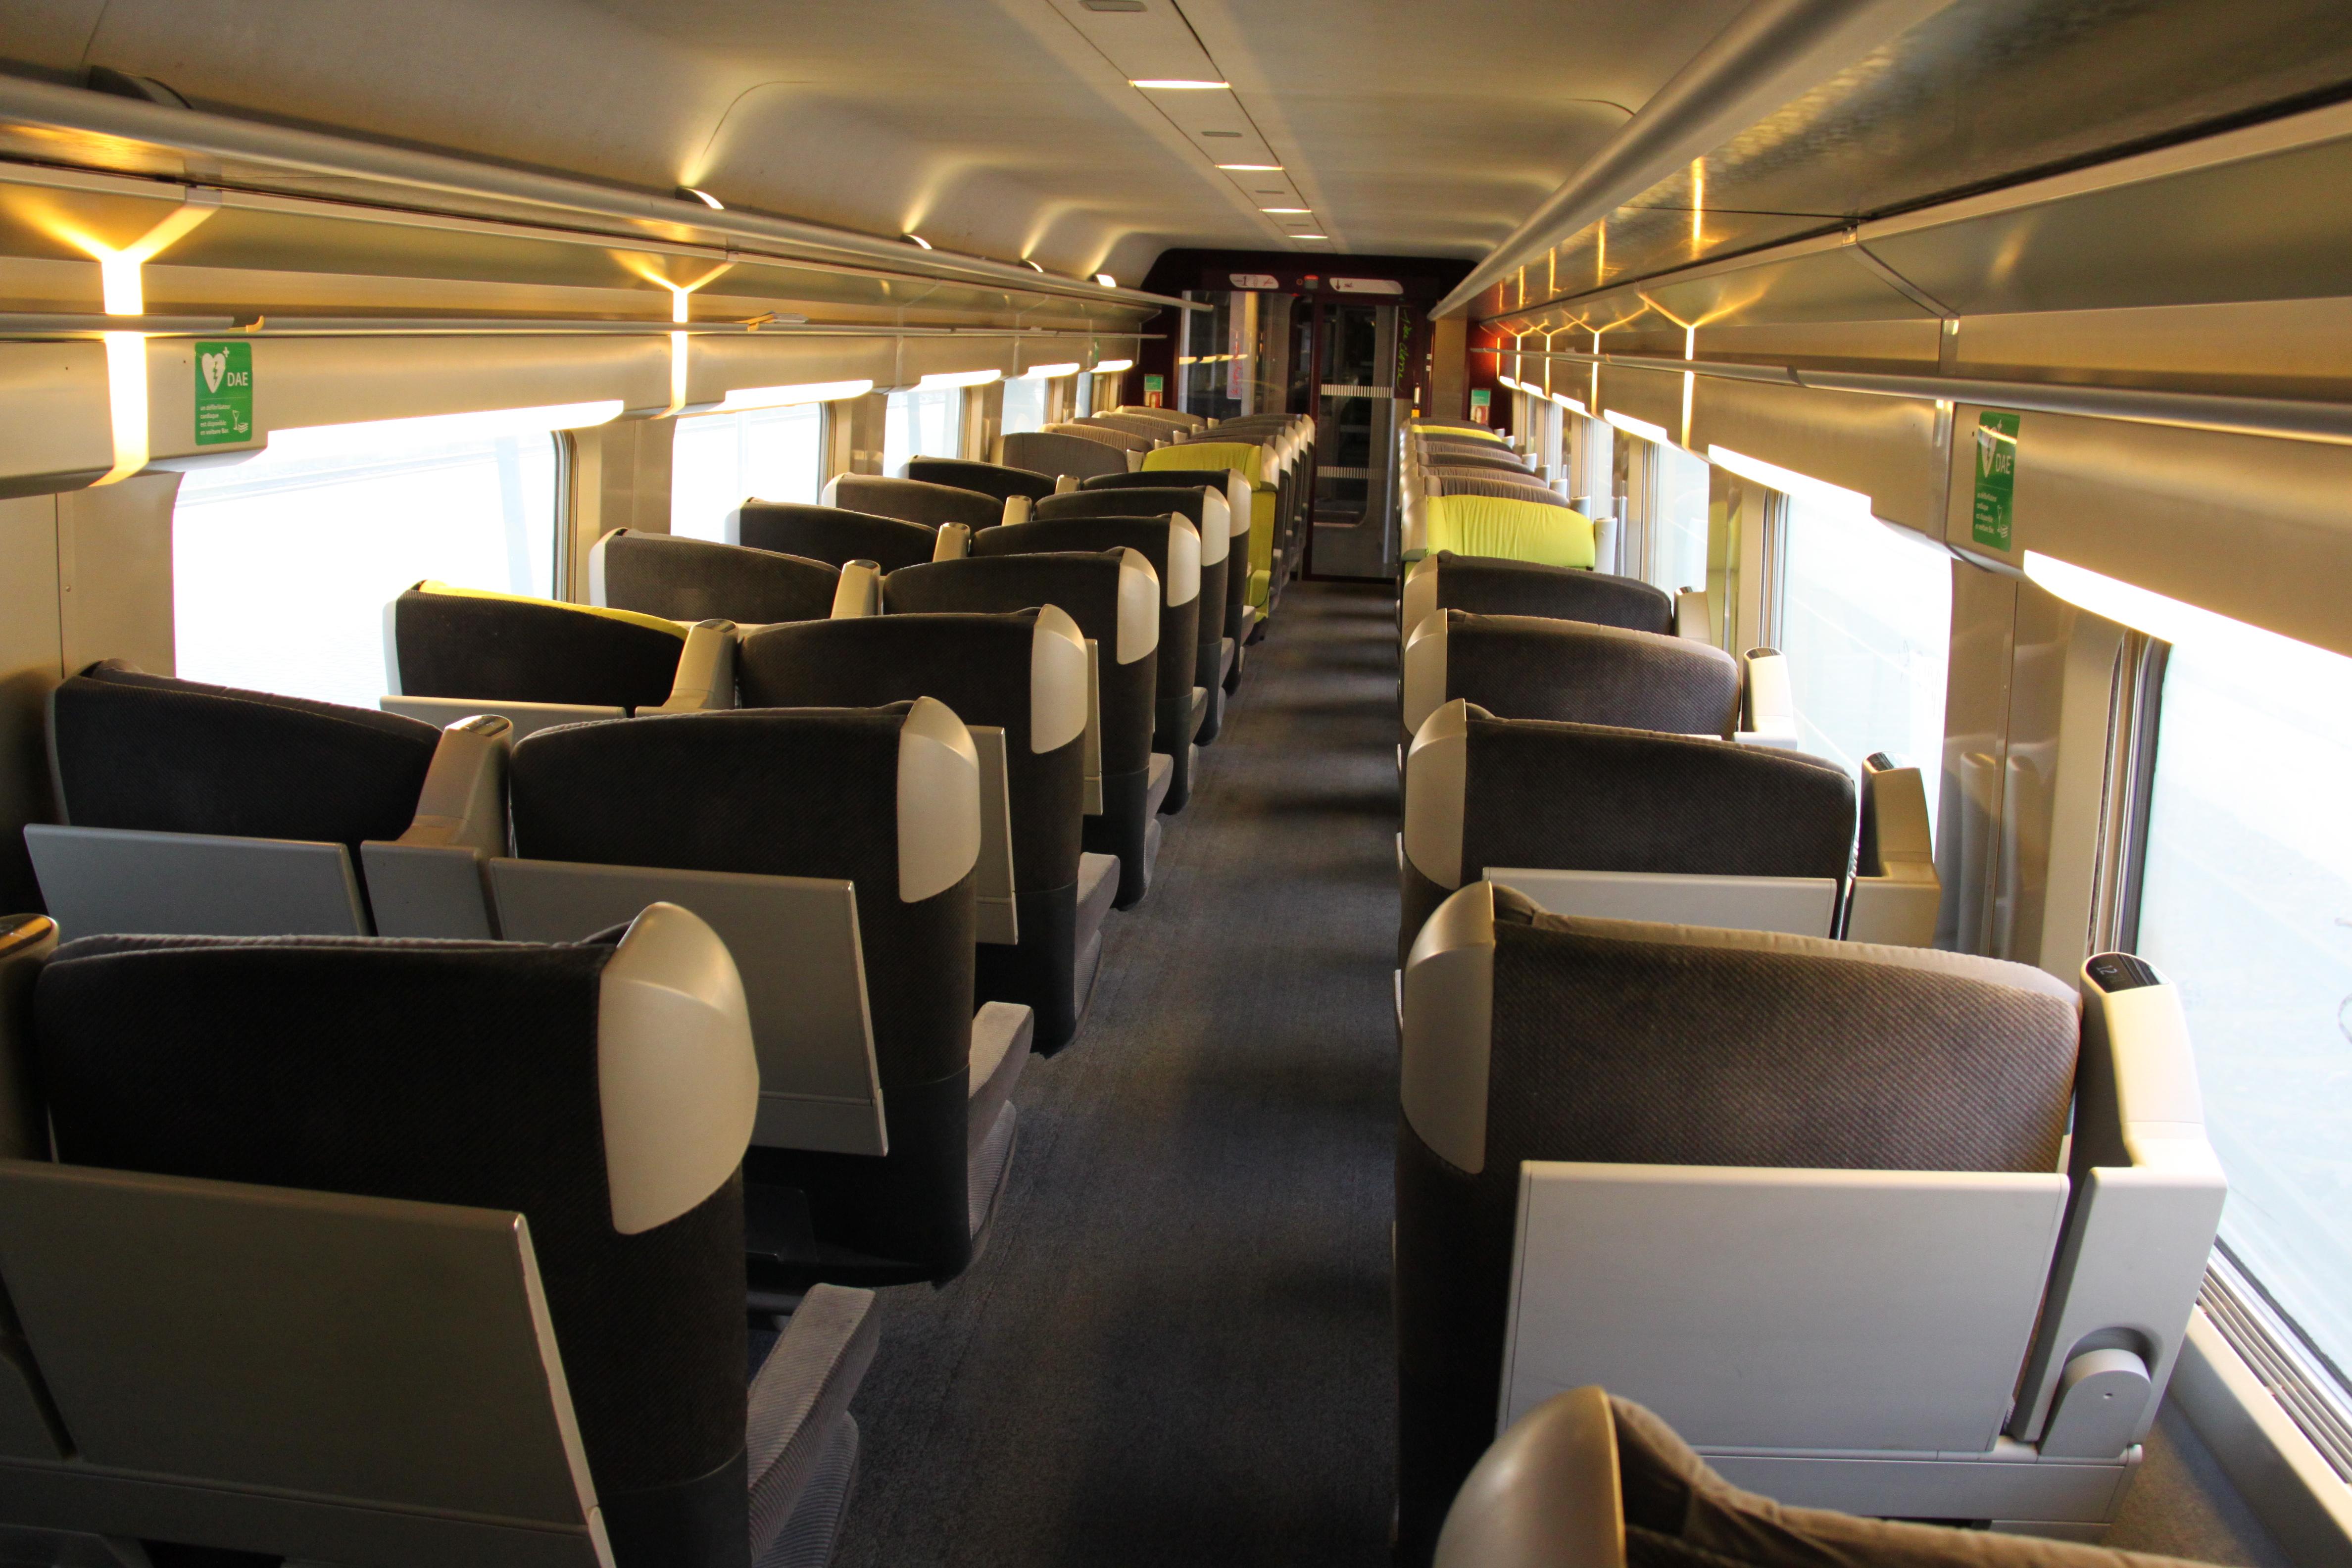 File:TGV Lacroix first class interior.JPG - Wikimedia Commons